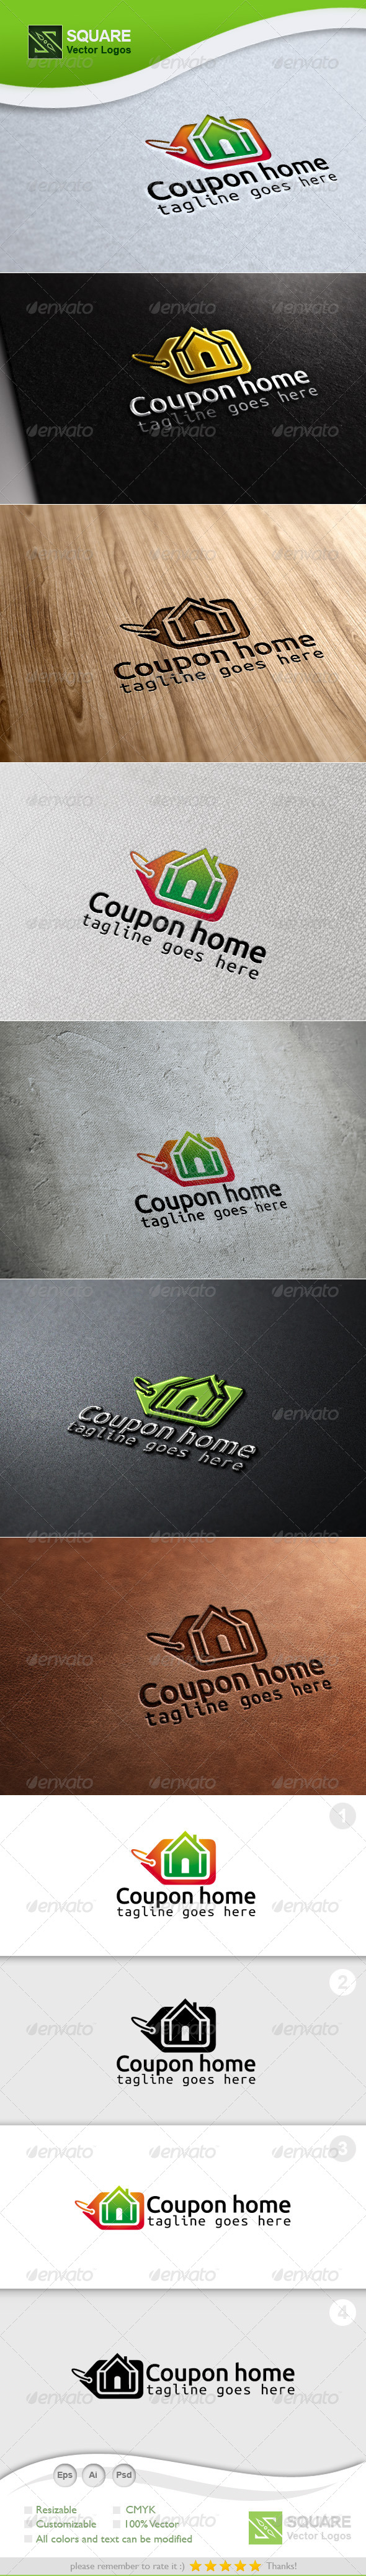 GraphicRiver Coupon Home Vector Logo Template 6726738